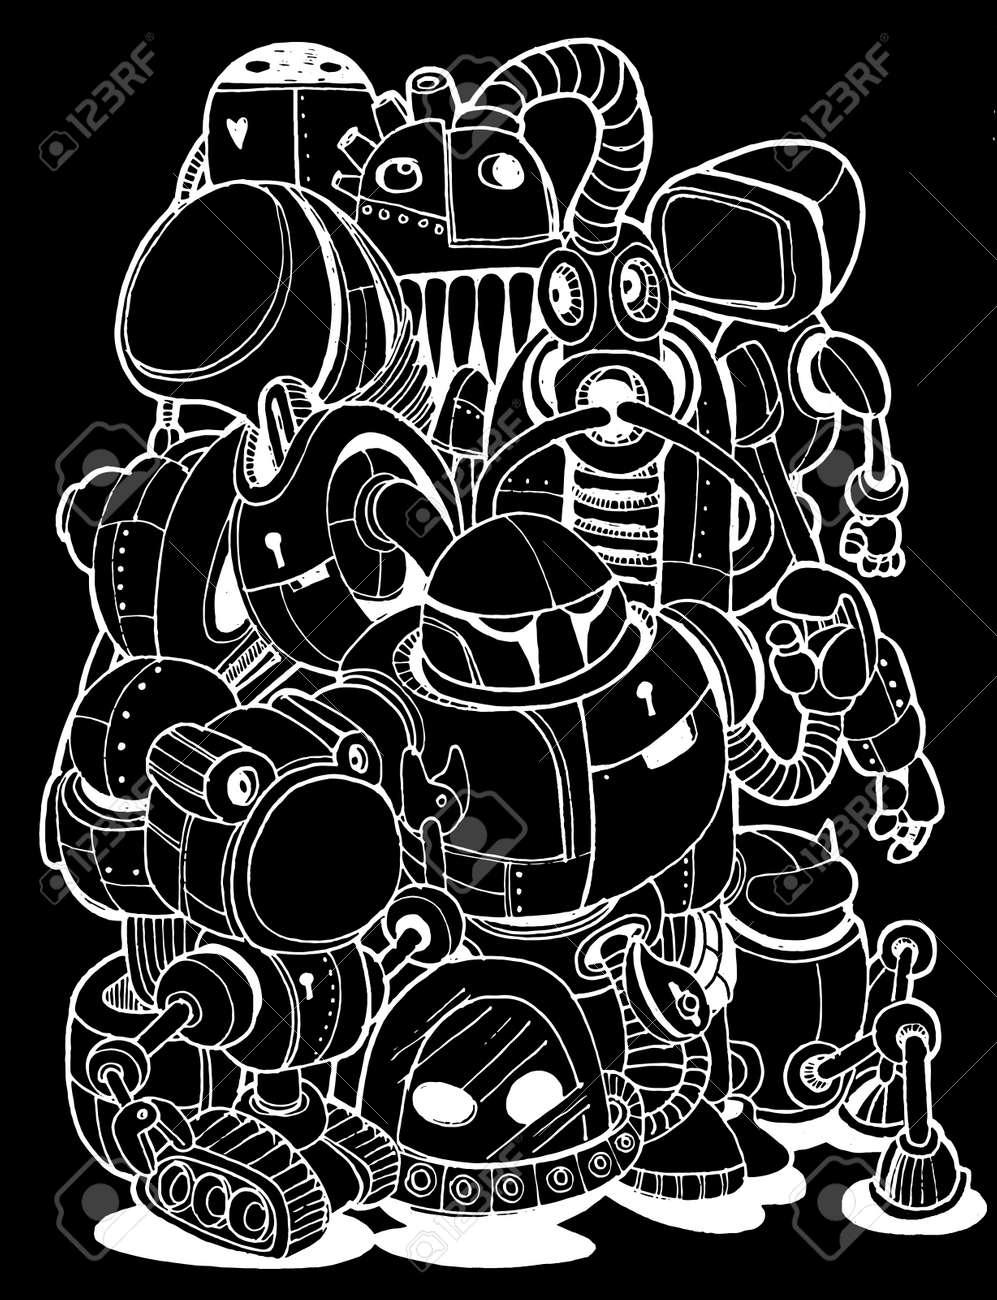 Hand Drawn Vector Illustration of Doodle robot element, illustrator